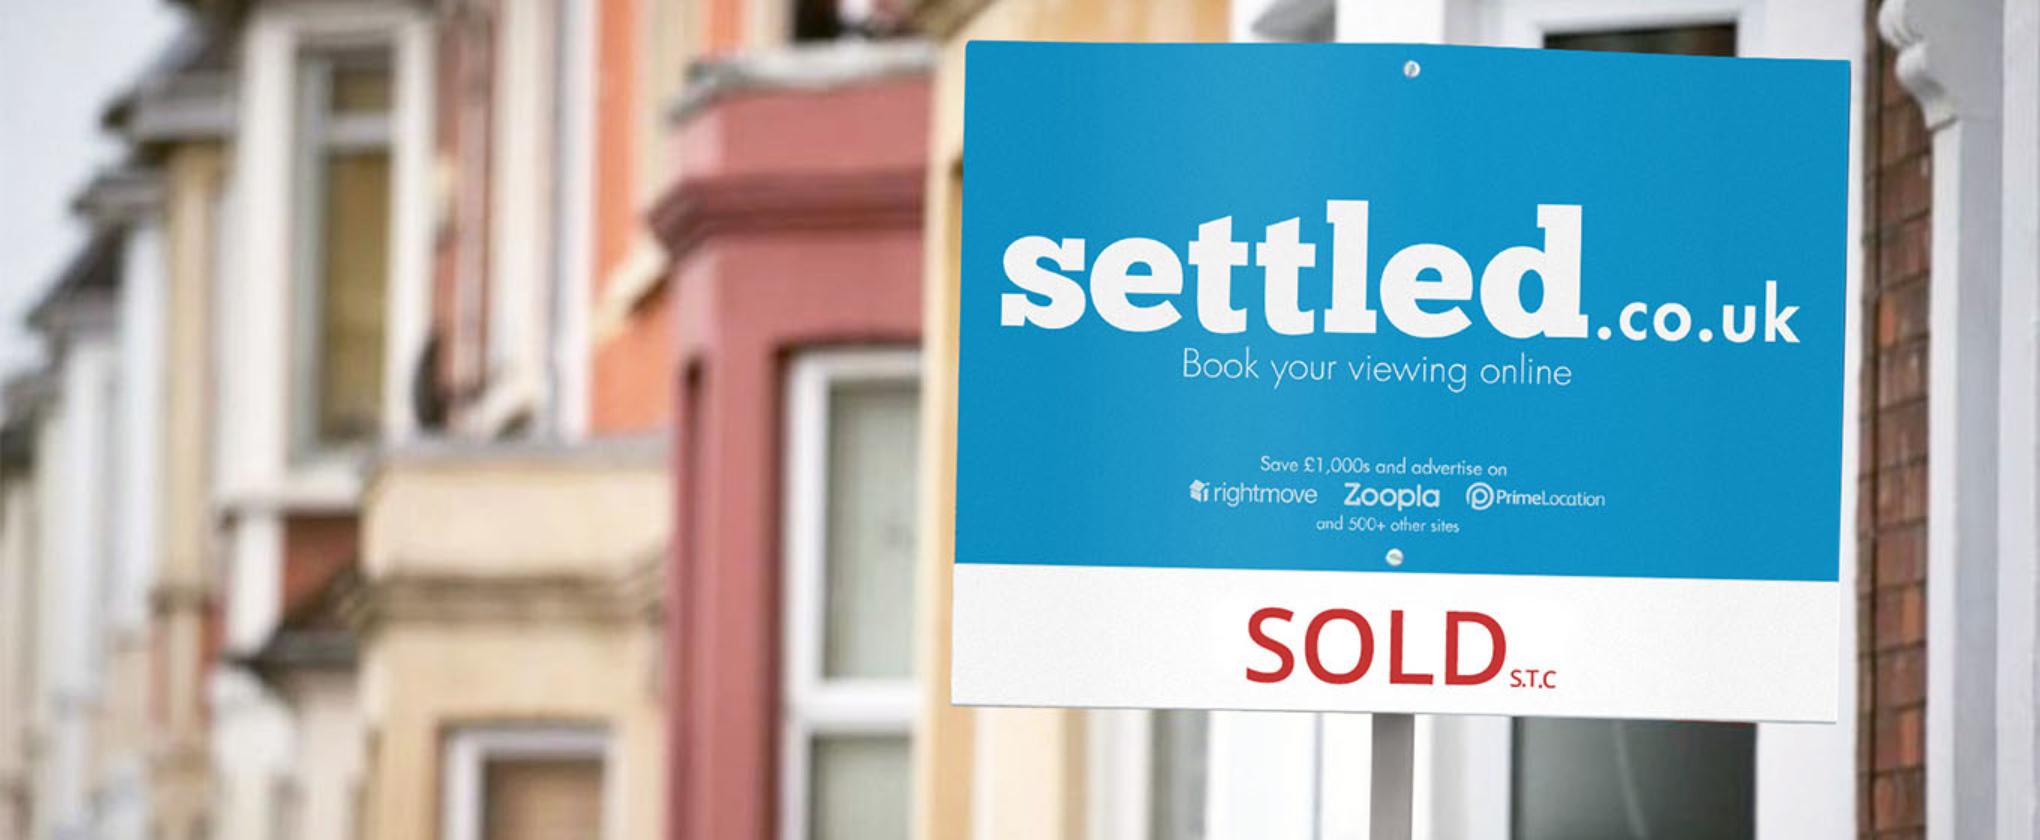 Settled Secures £1 Million Investment